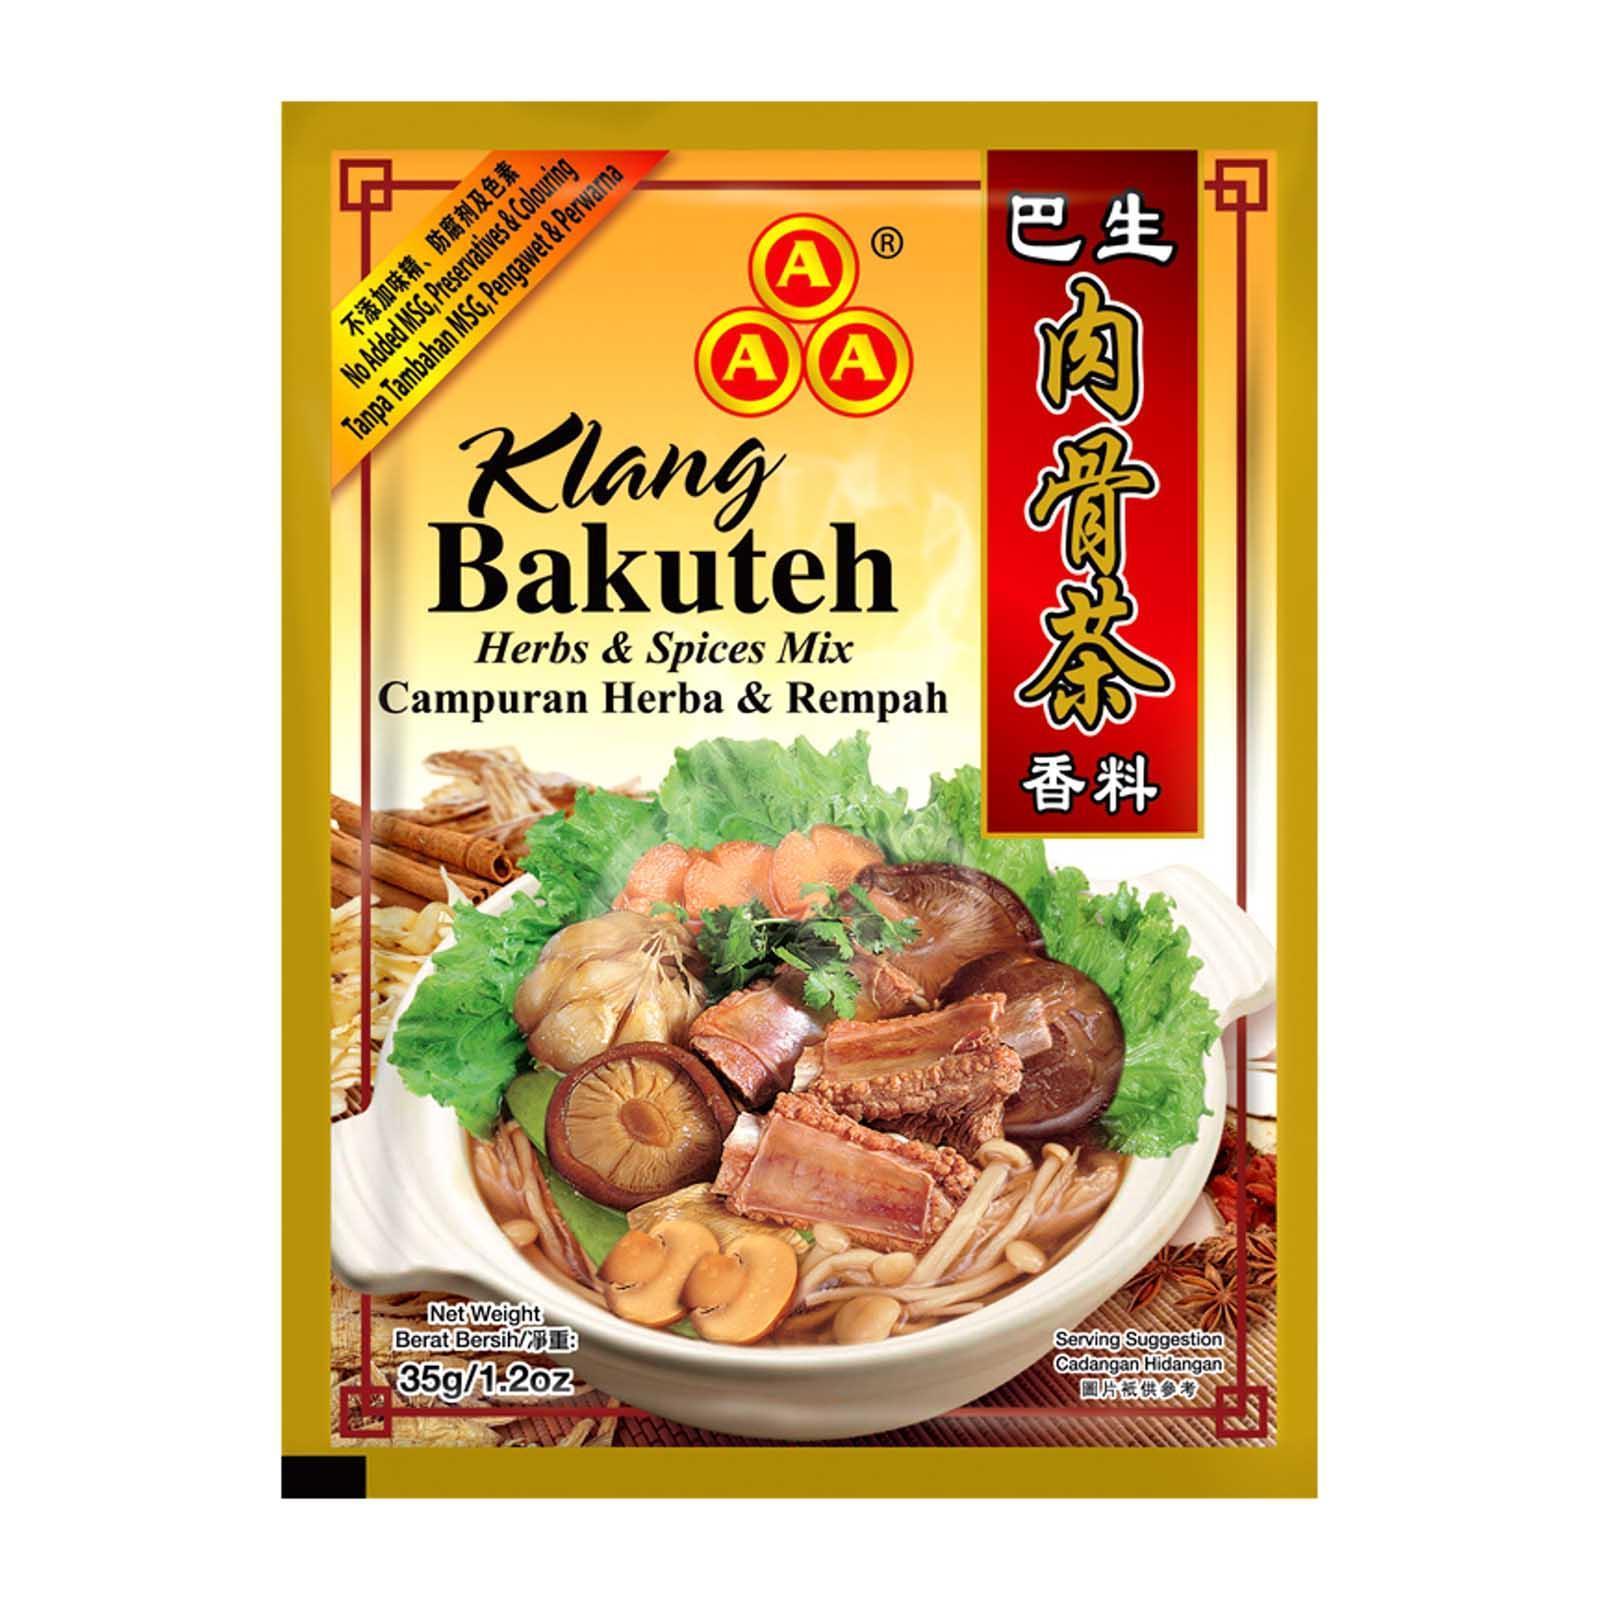 3A Klang Bakuteh Spices